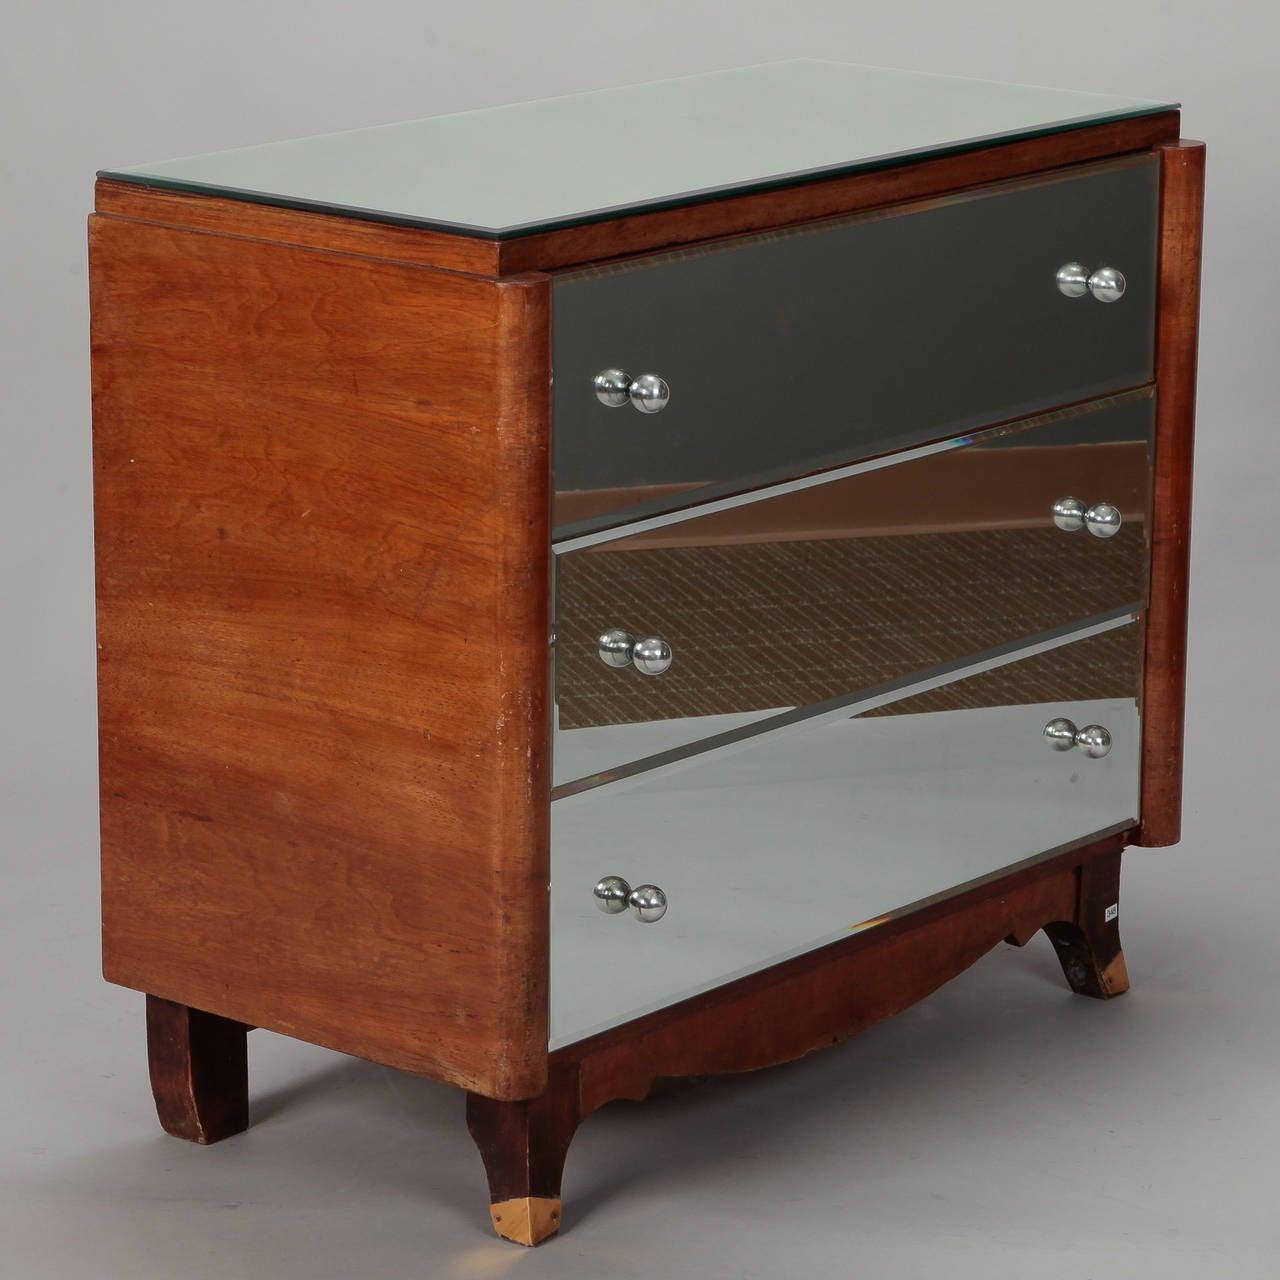 Brass Art Deco Era Mirrored Walnut Chest of Drawers